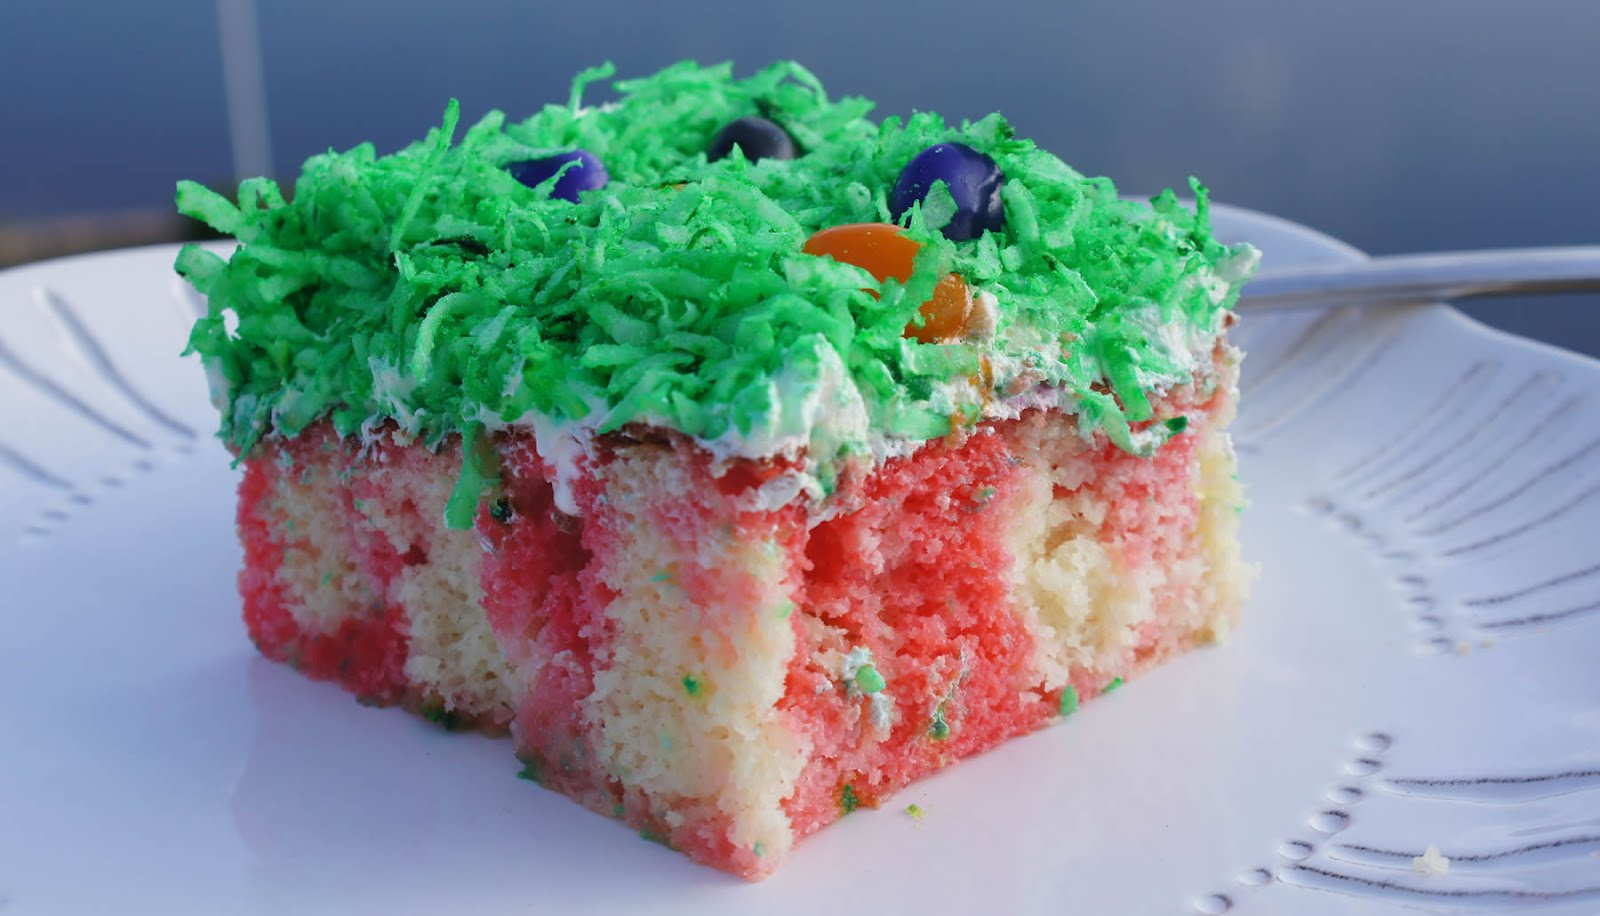 Cake Recipe Jelly Beans: Little Bit Of Everything: Jelly Bean Poke Cake